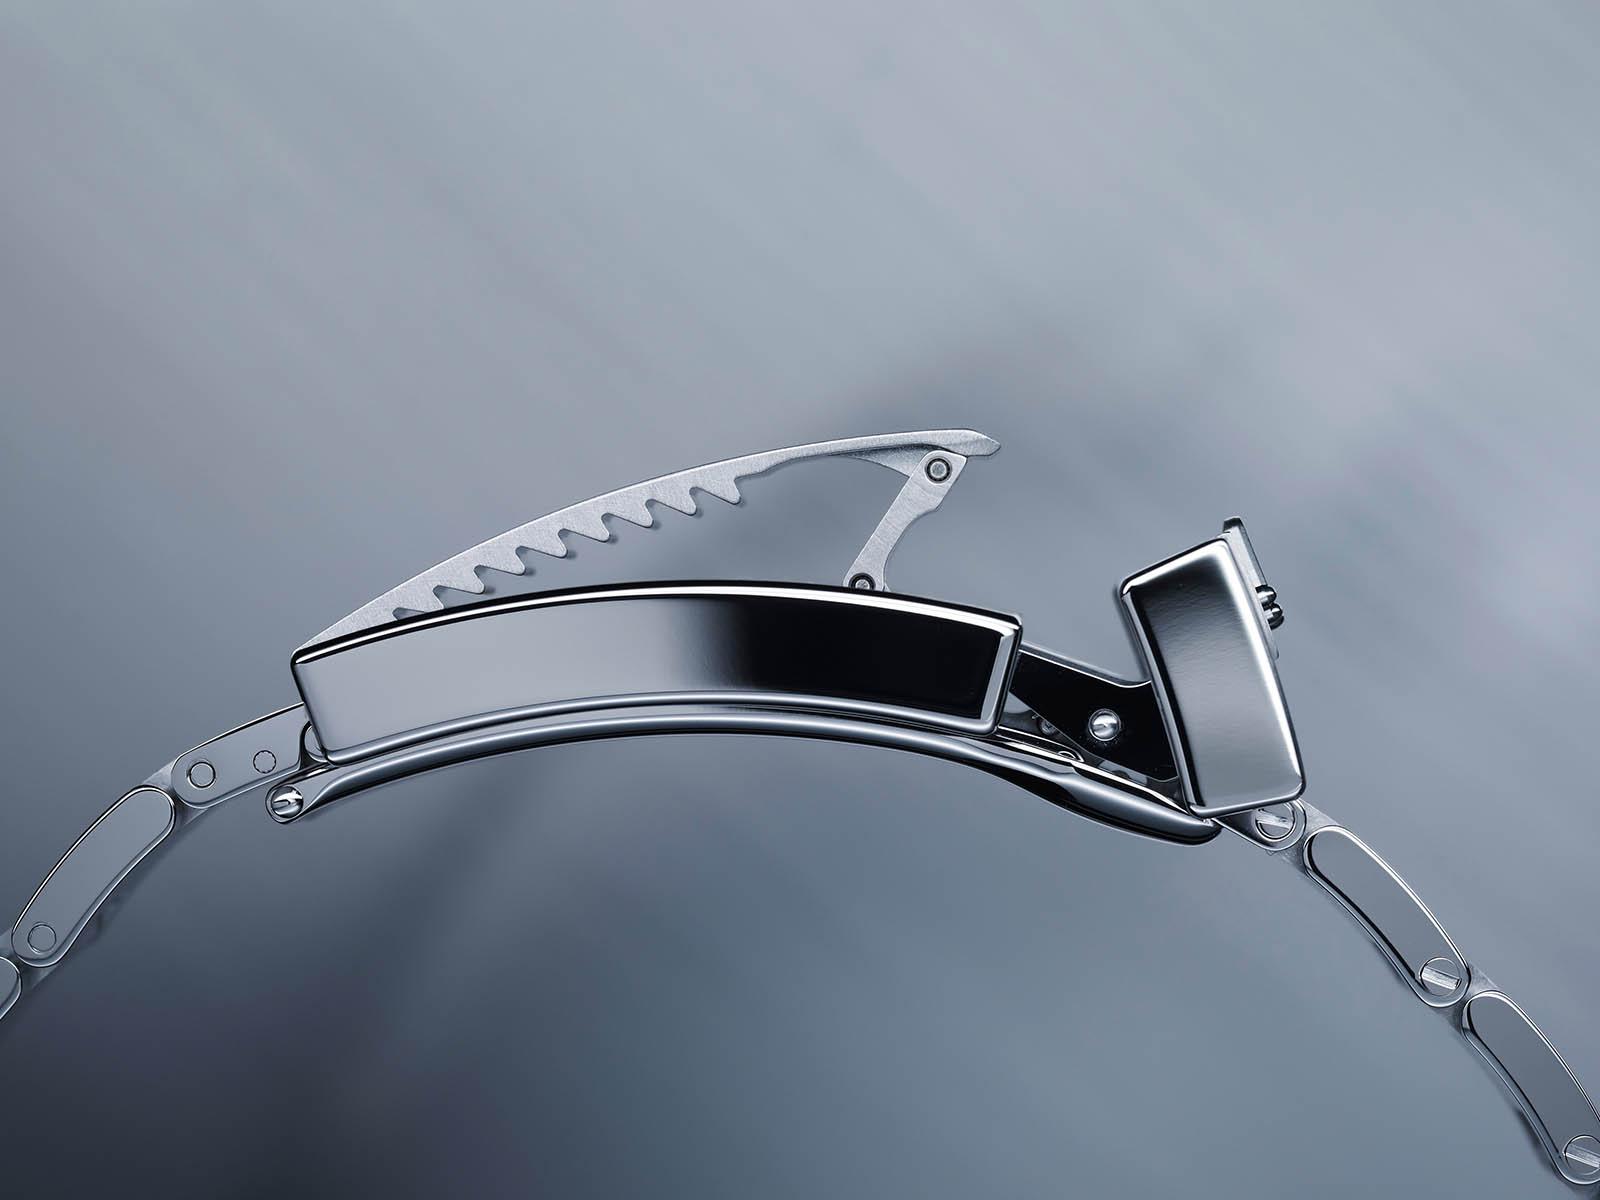 rolex-bracelets-and-straps-glidelock-1.jpg